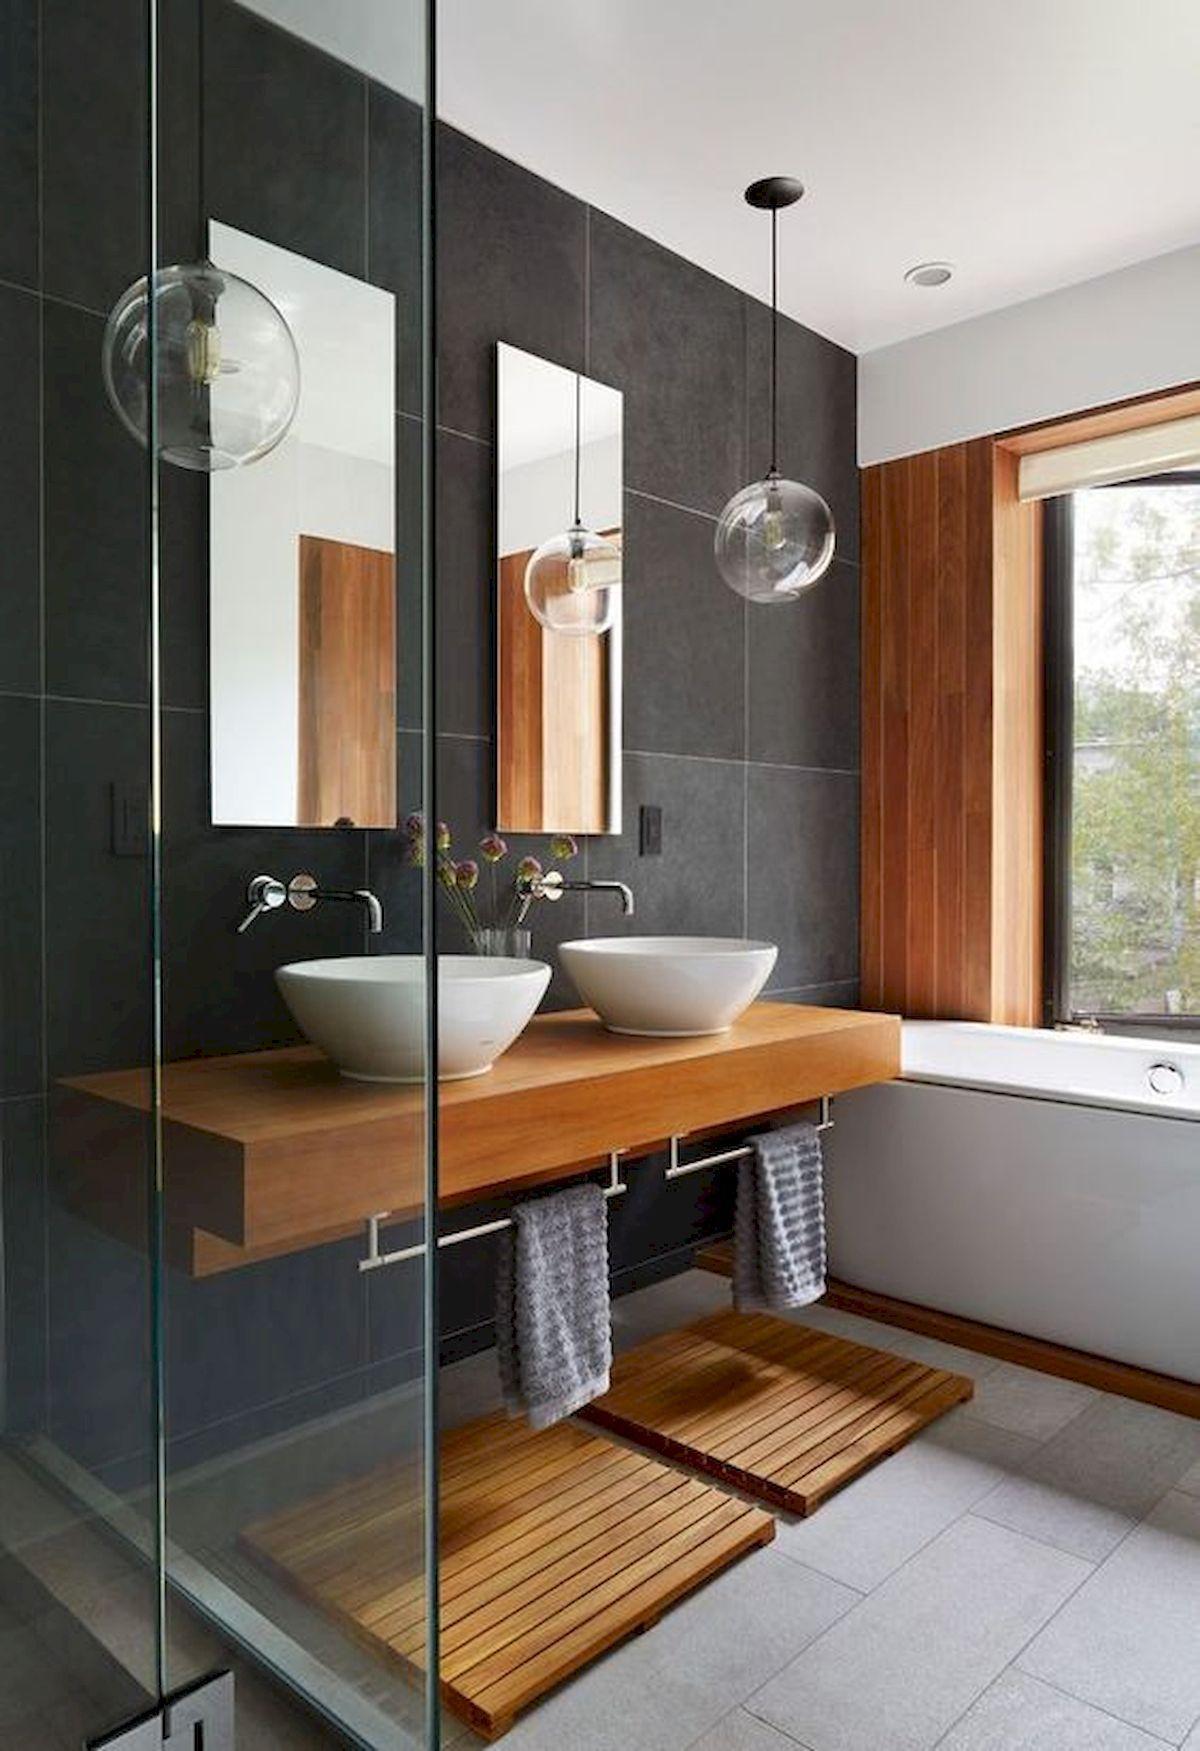 33 Best Industrial Style Bathrooms Ideas Bathrooms Bestbathroomdecor Diyhomeaccessories Diyki In 2020 Zen Badezimmer Badezimmer Design Badezimmer Umgestalten